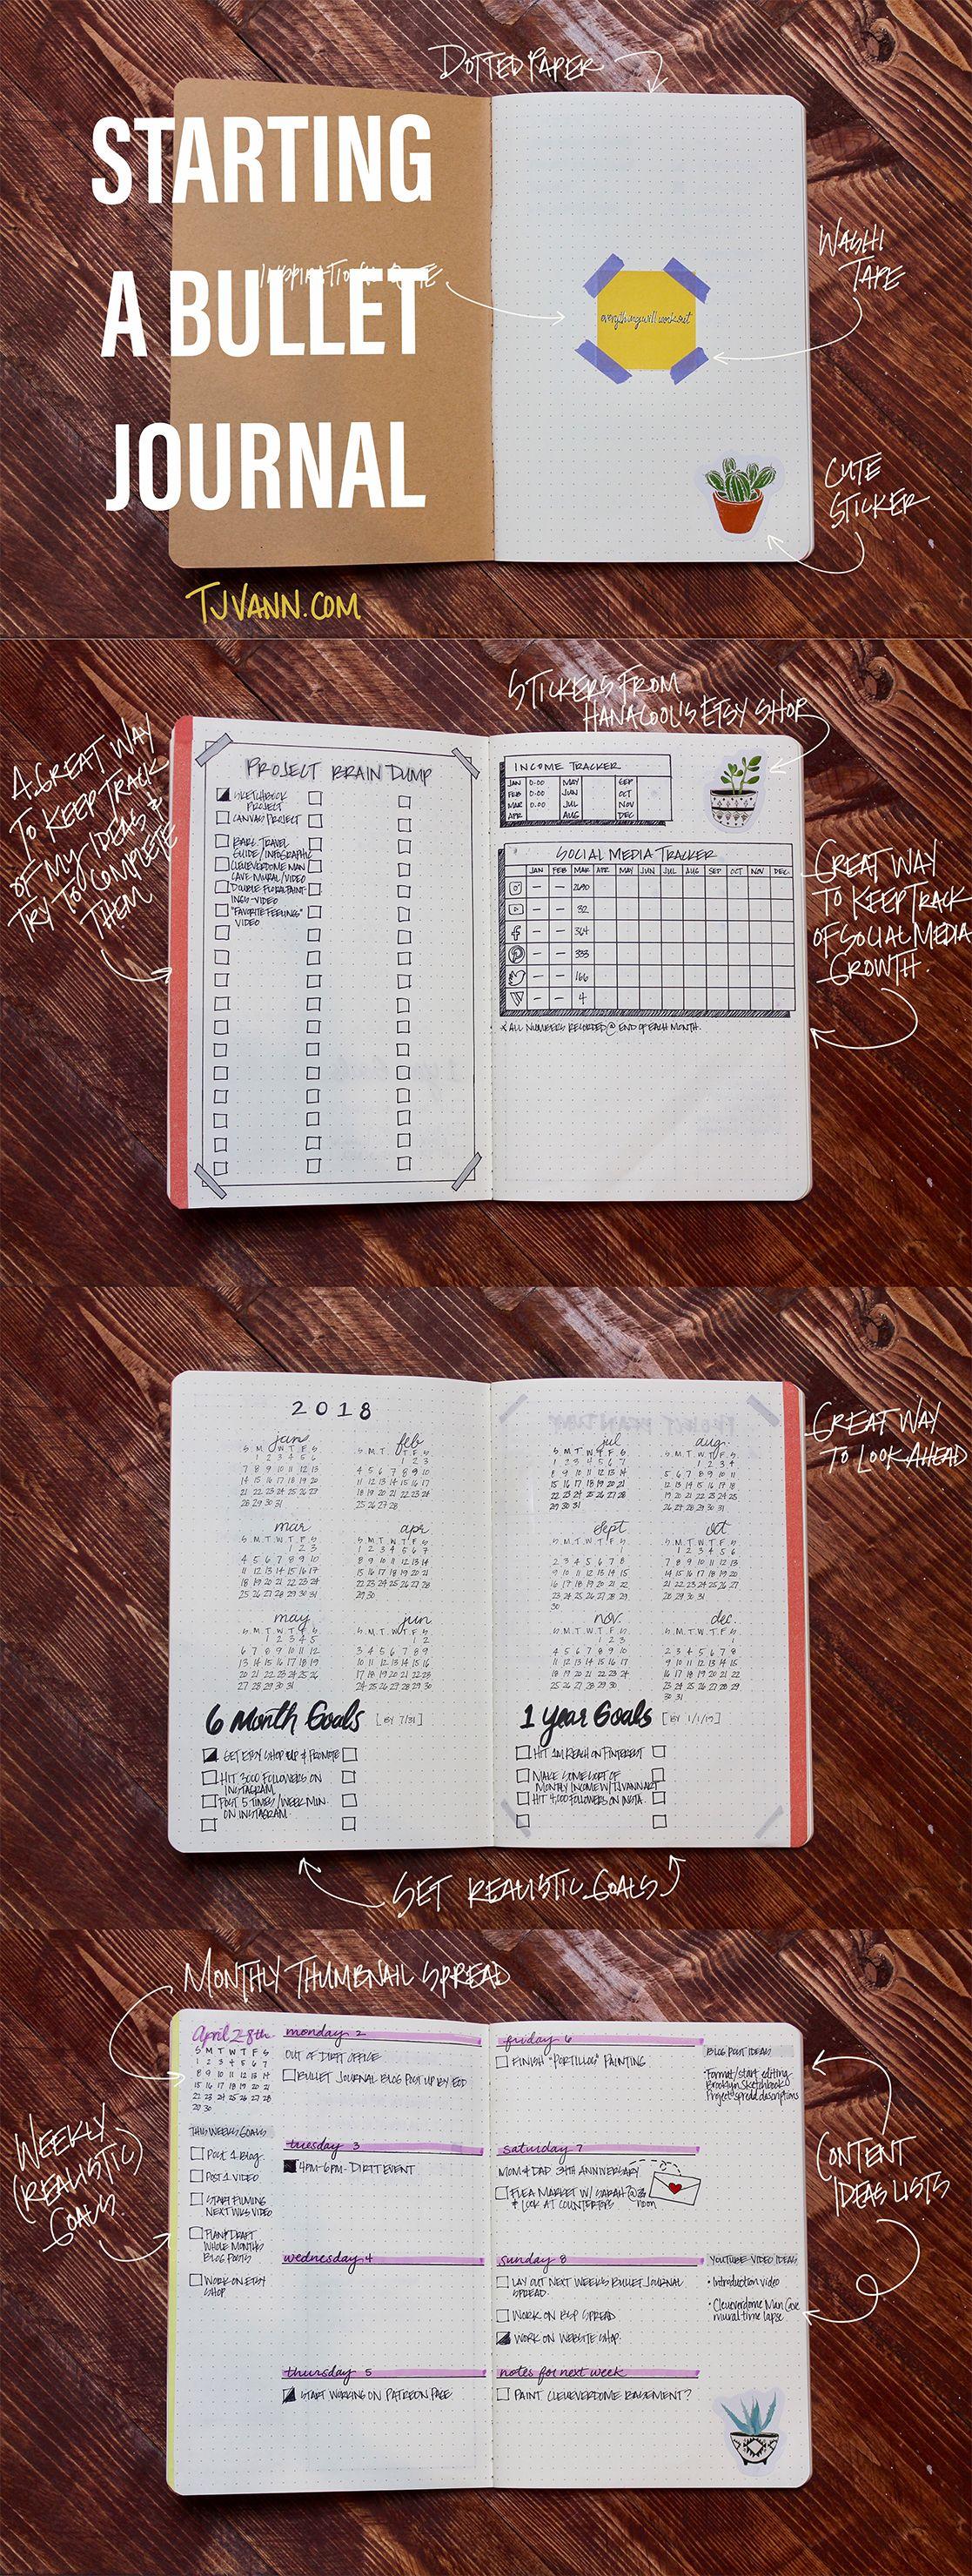 Starting A Bullet Journal Bullet Journal Inspiration Bullet Journal Journal